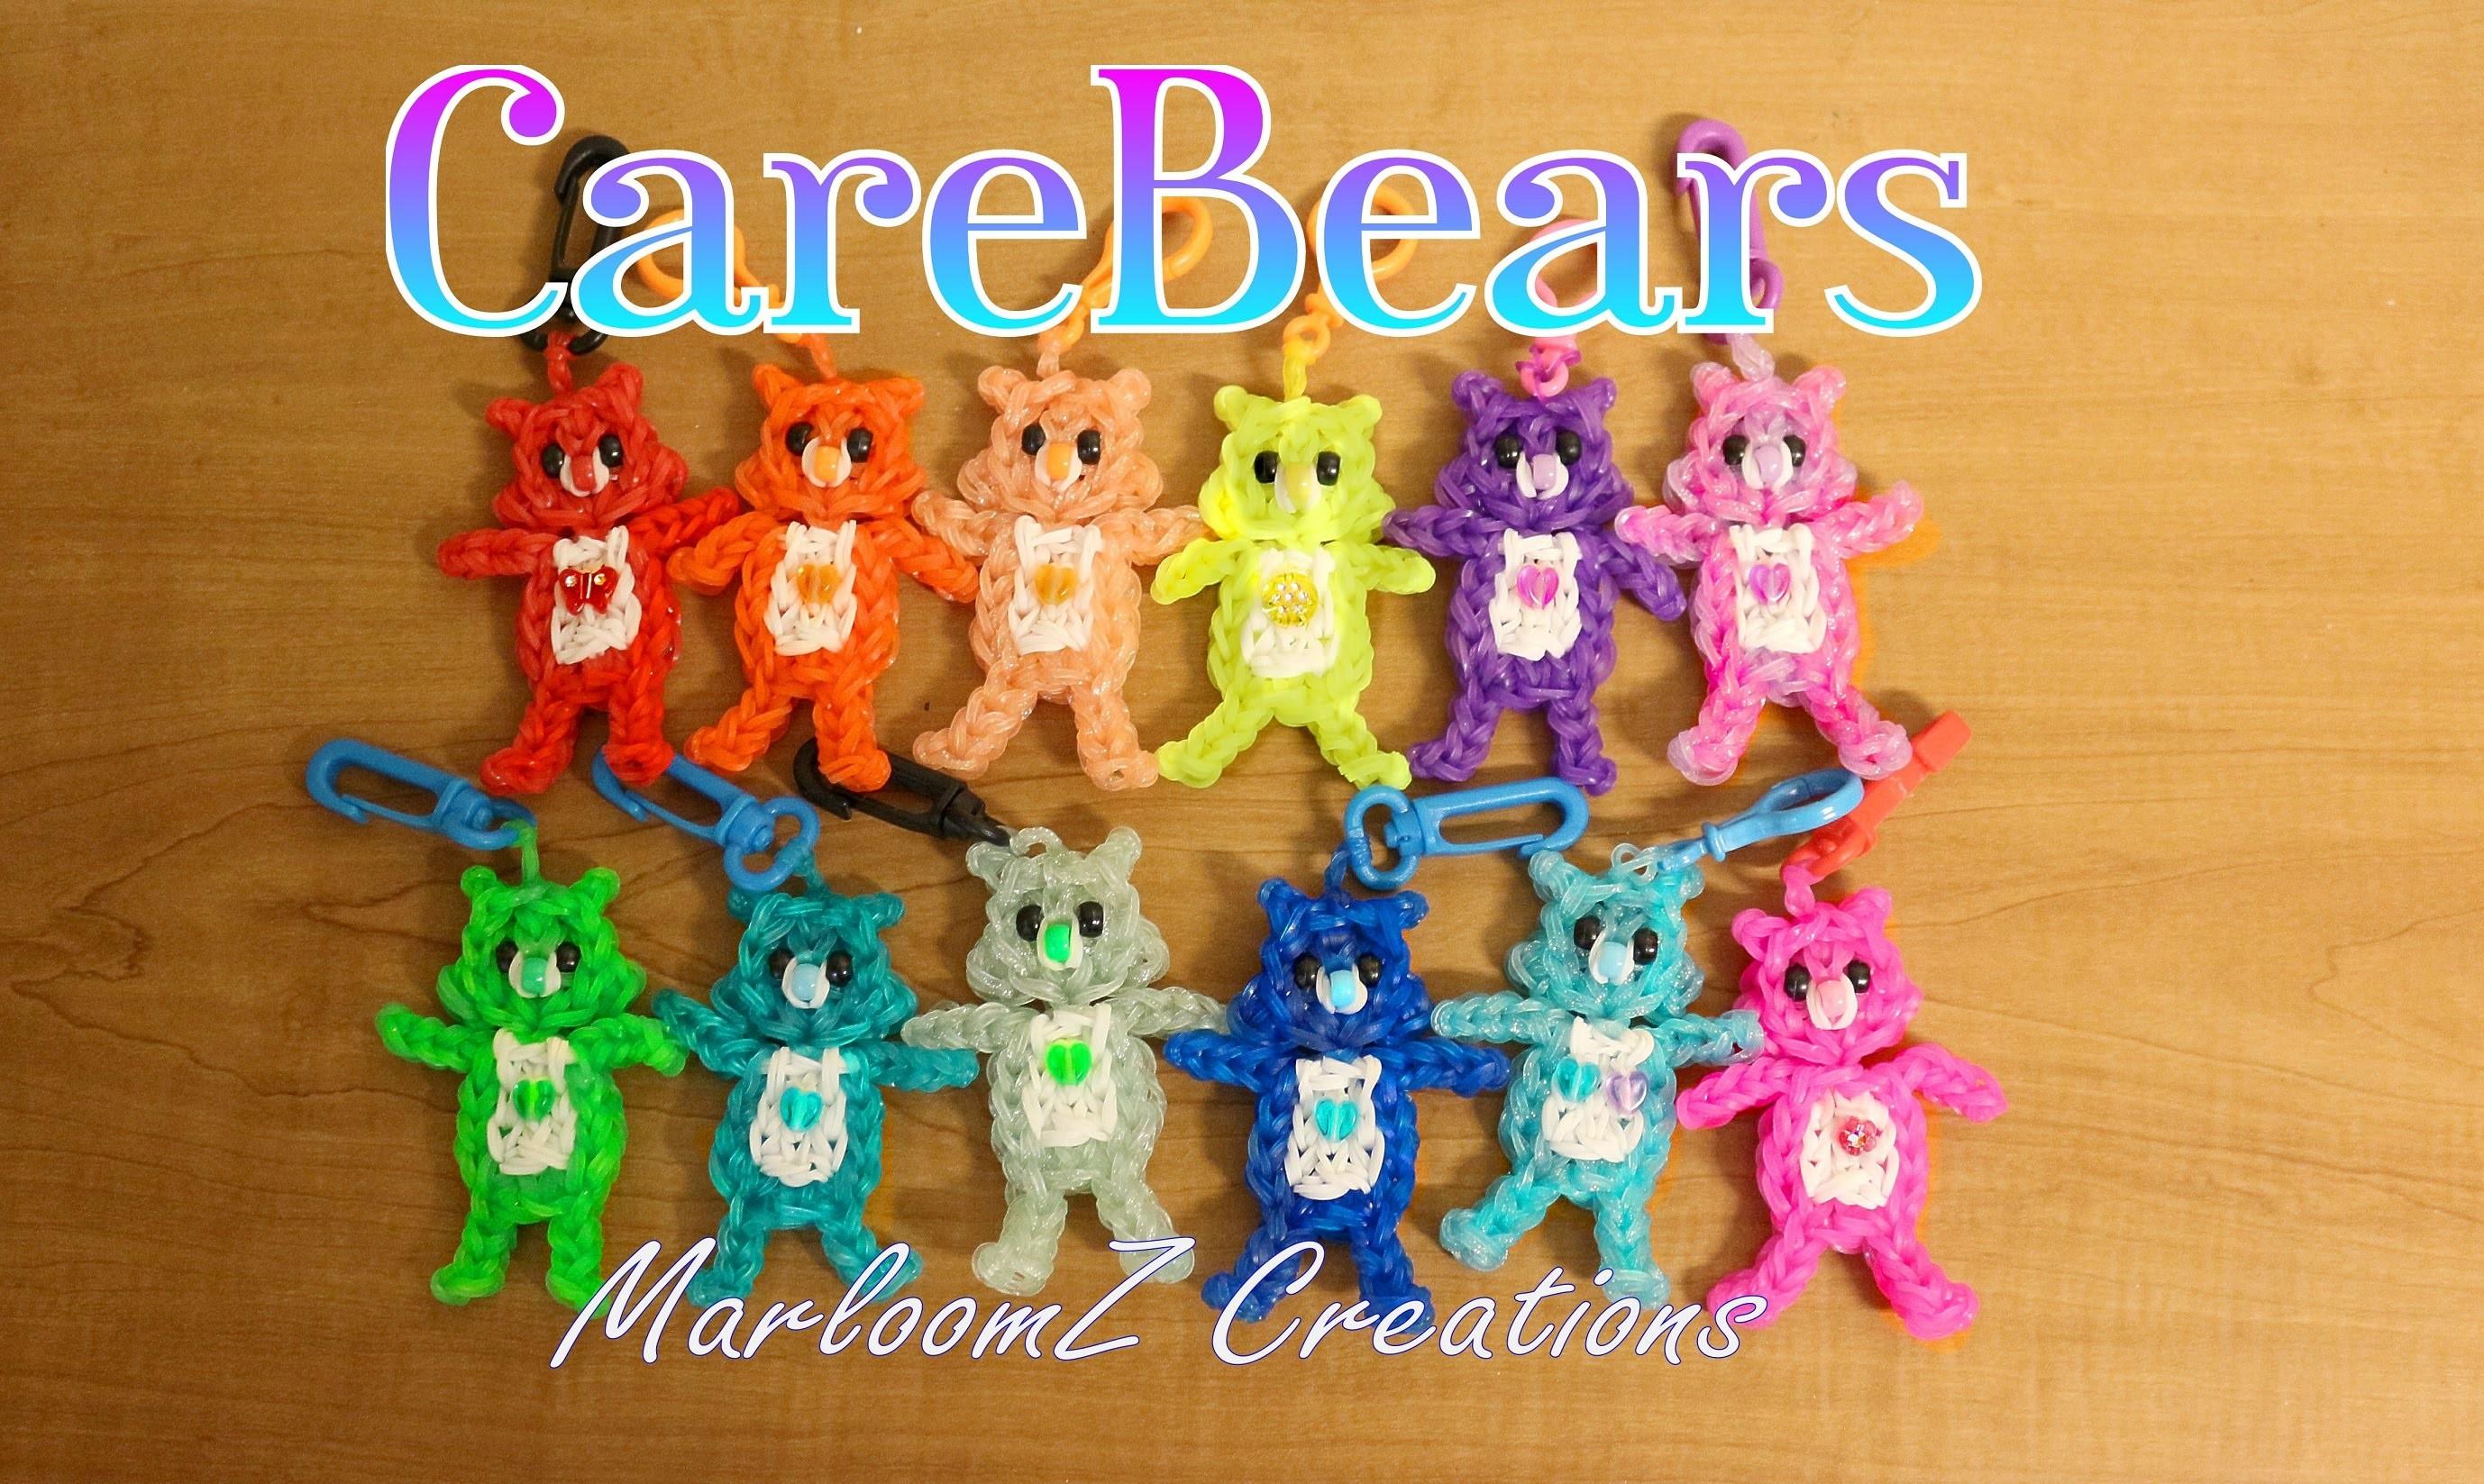 Rainbow Loom Care Bears Tutorial. How To using loom bands